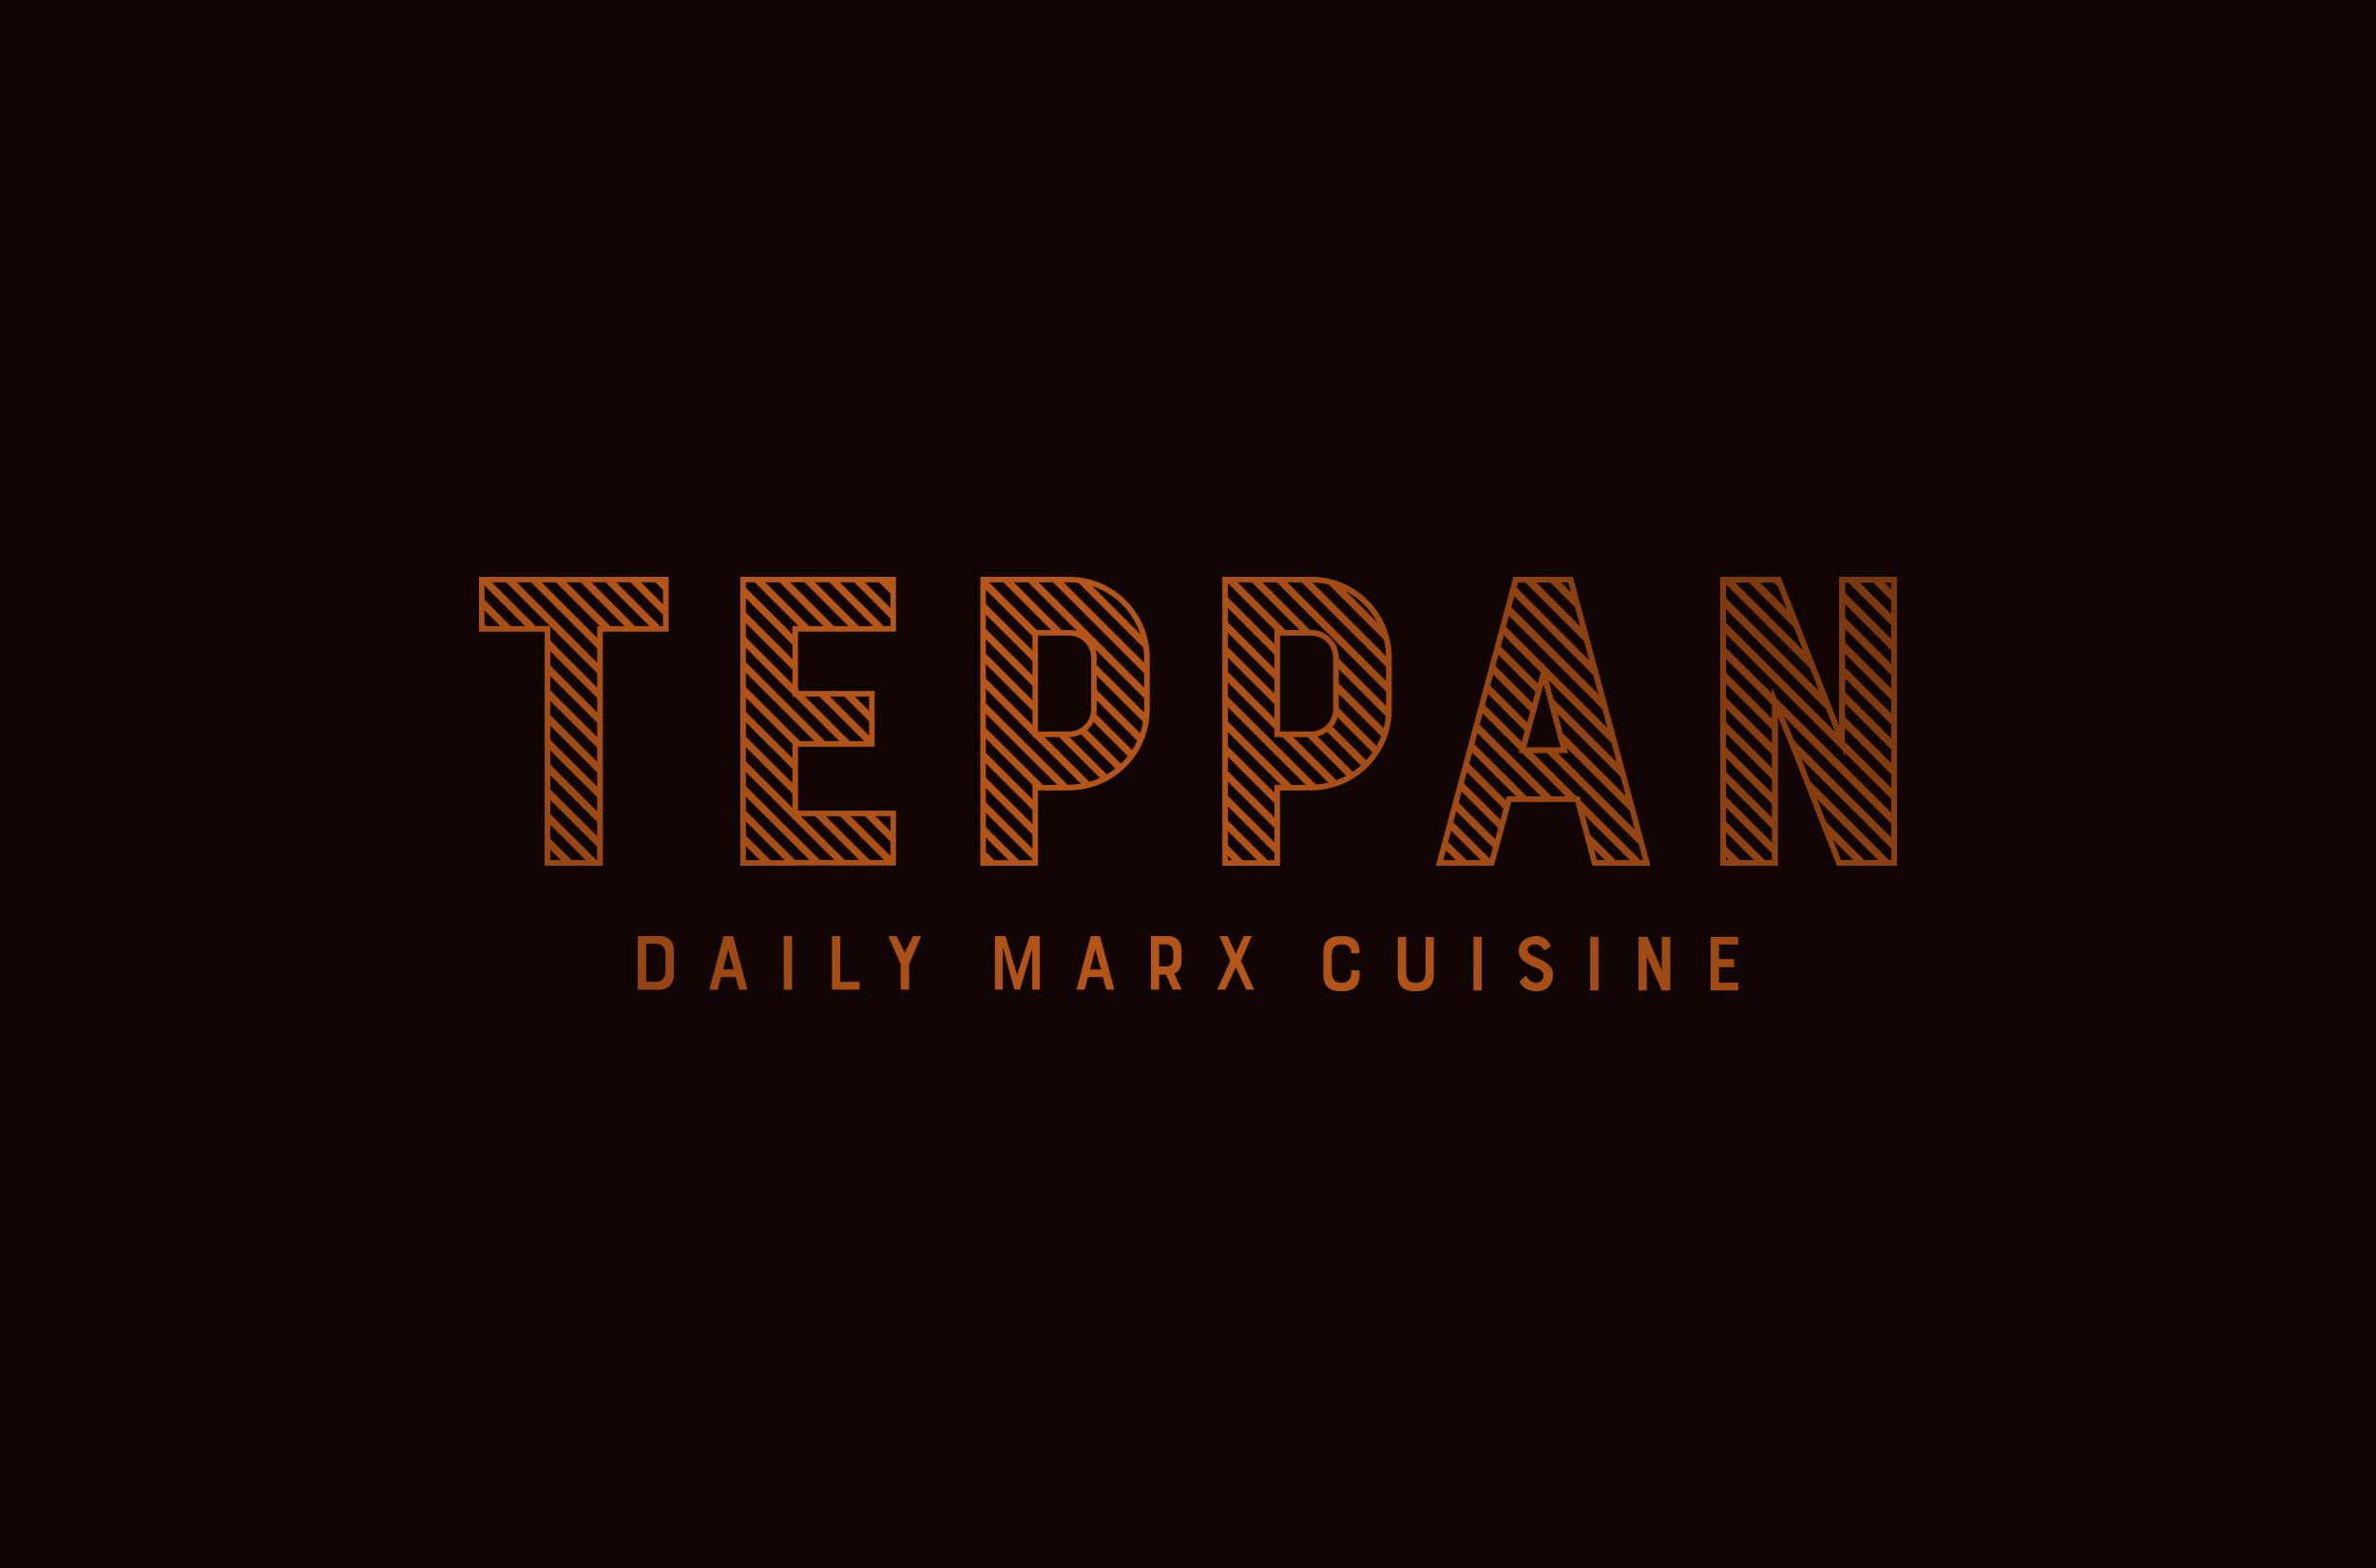 Teppan - 1